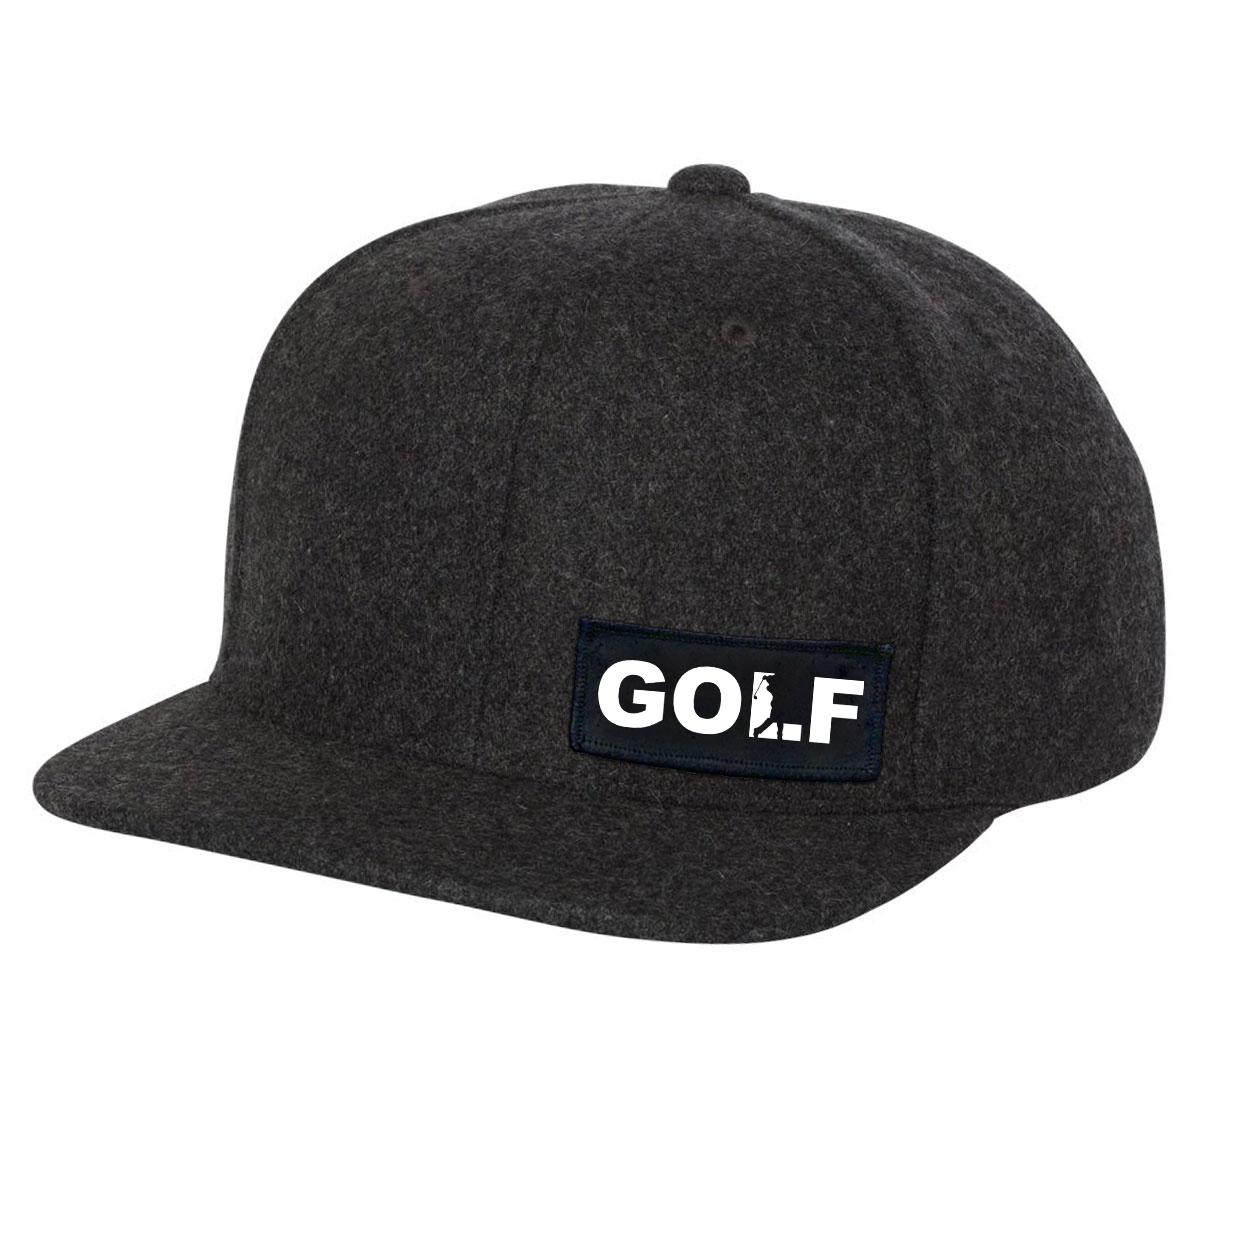 Golf Swing Logo Night Out Woven Patch Flat Brim Snapback Hat Dark Heather Gray Wool (White Logo)